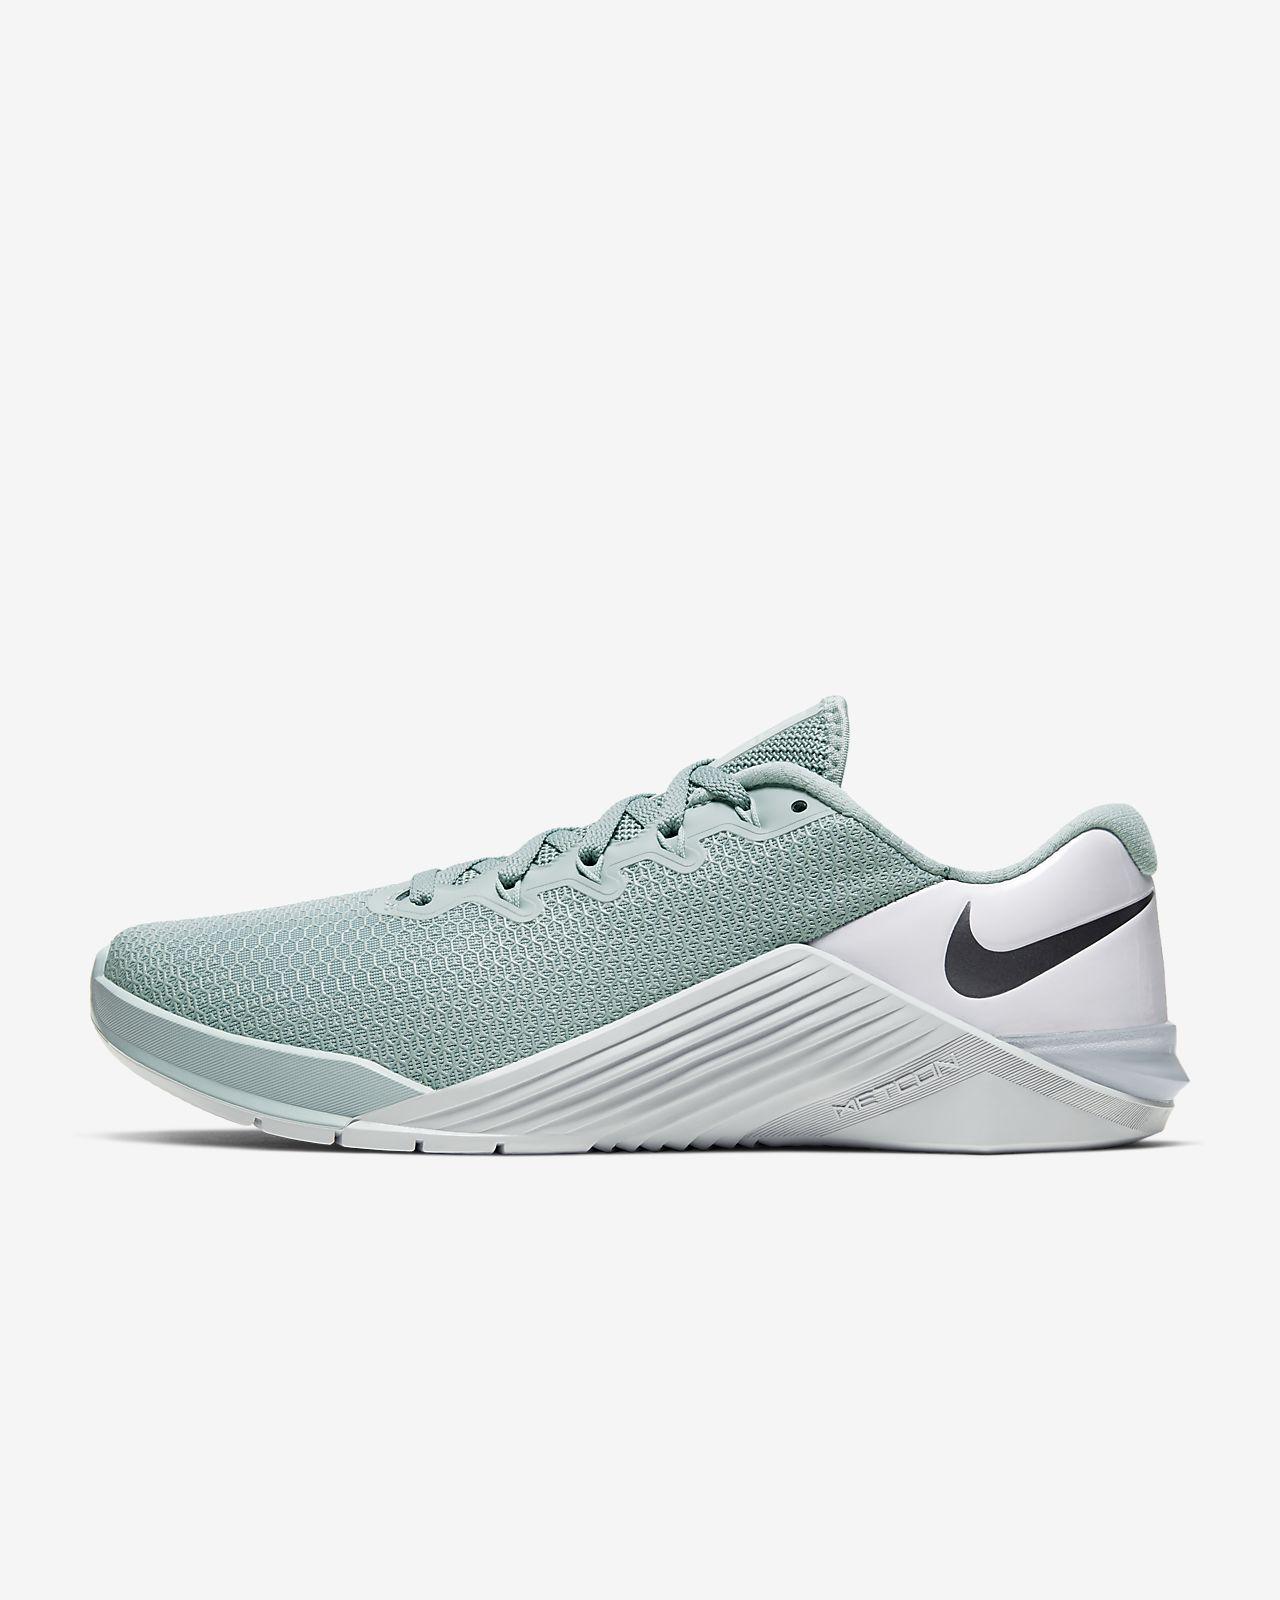 Nike Metcon 5 Damen-Trainingsschuh